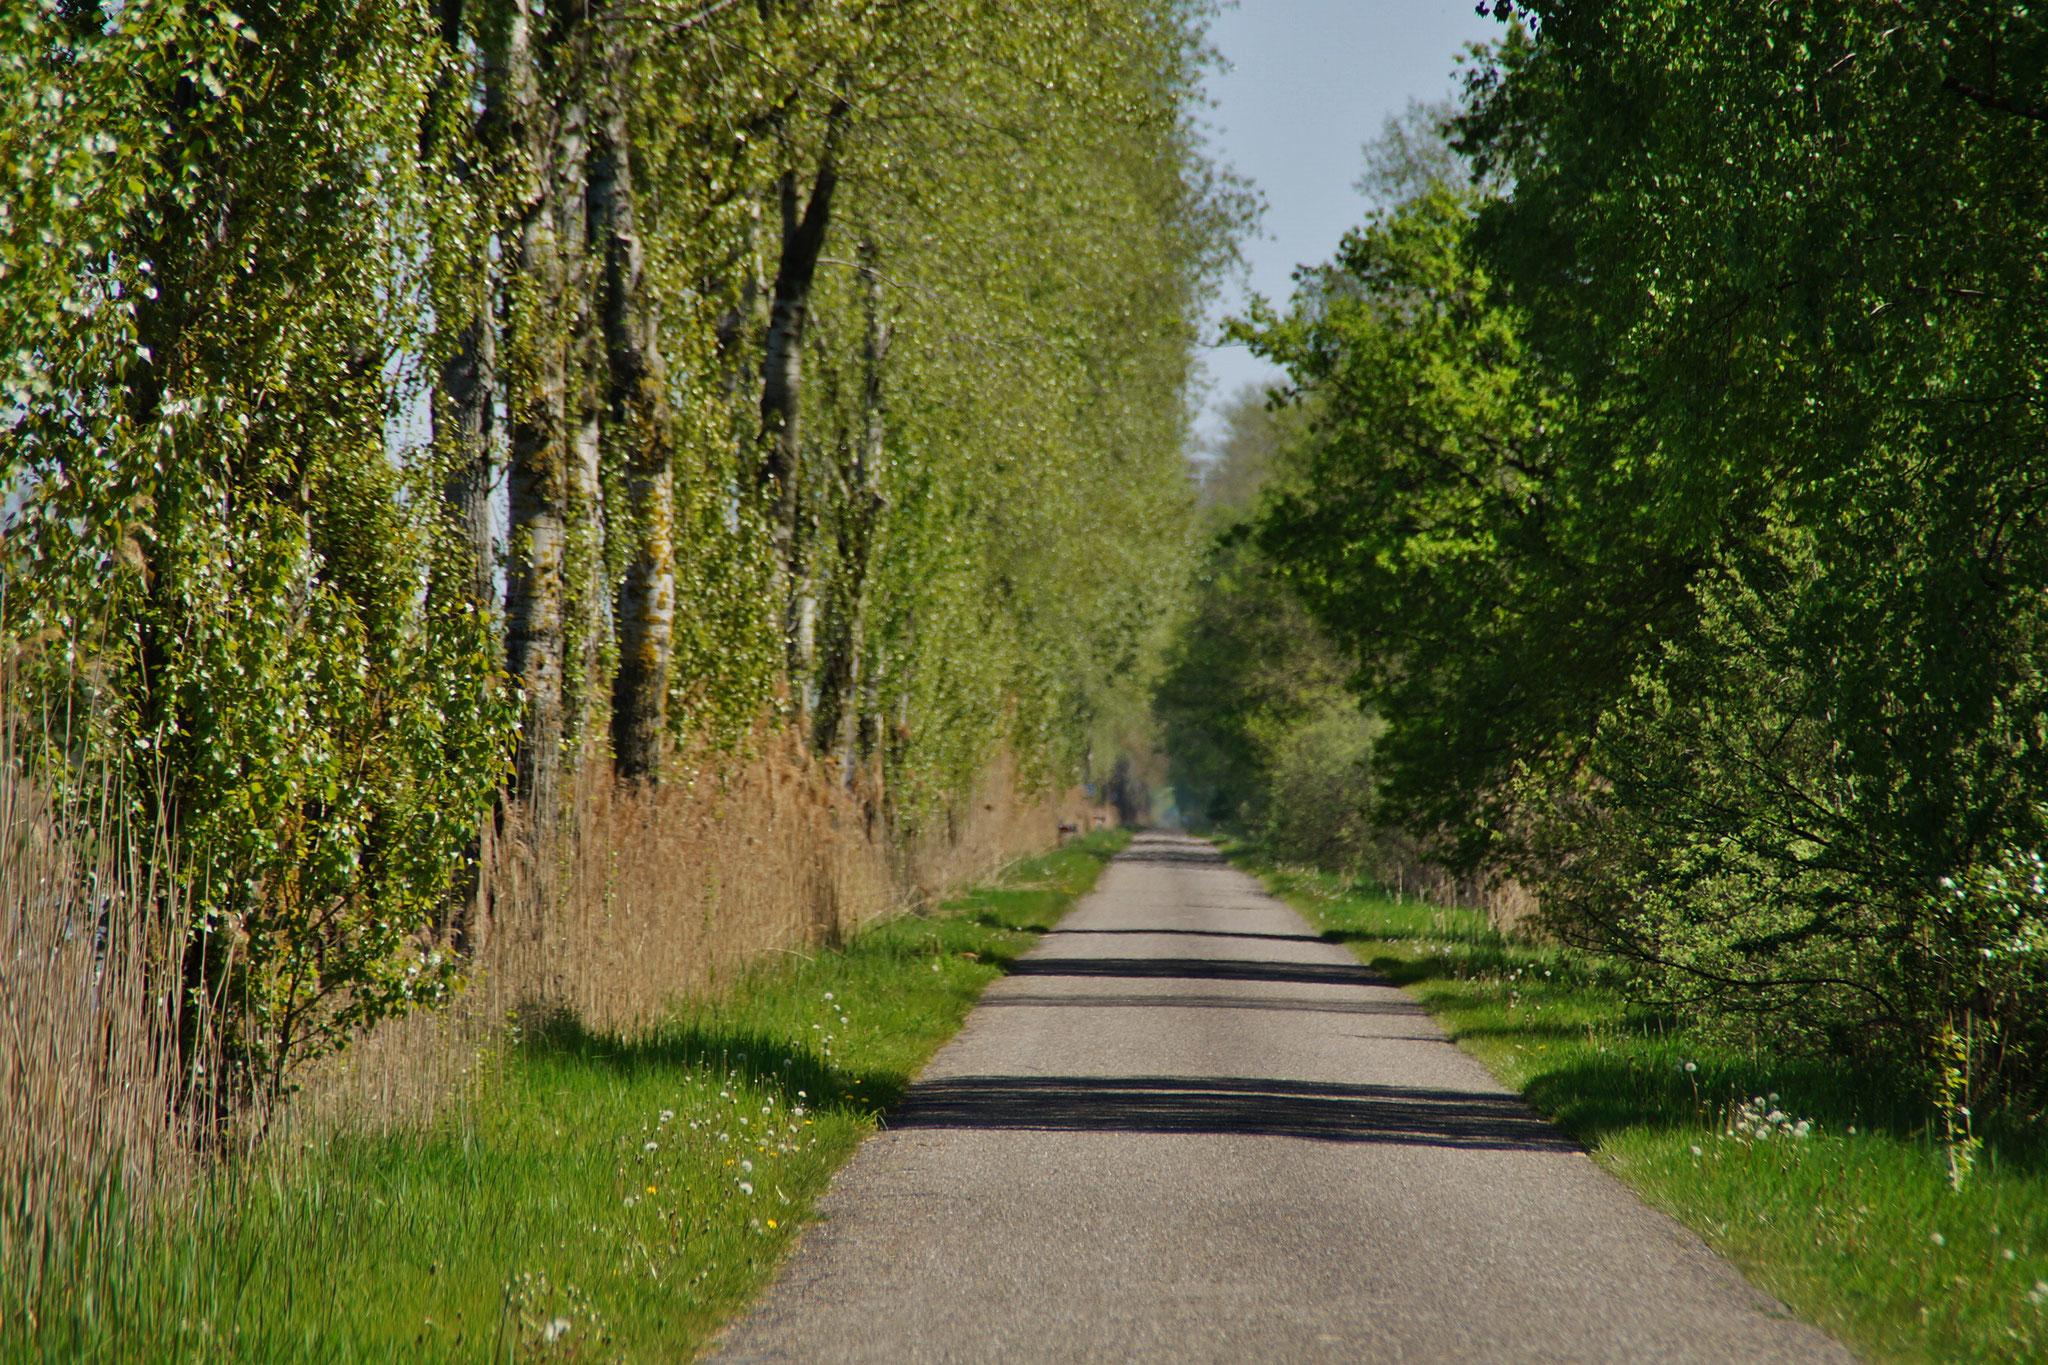 Alte Straße nach Lozen (B) am Kanal entlang